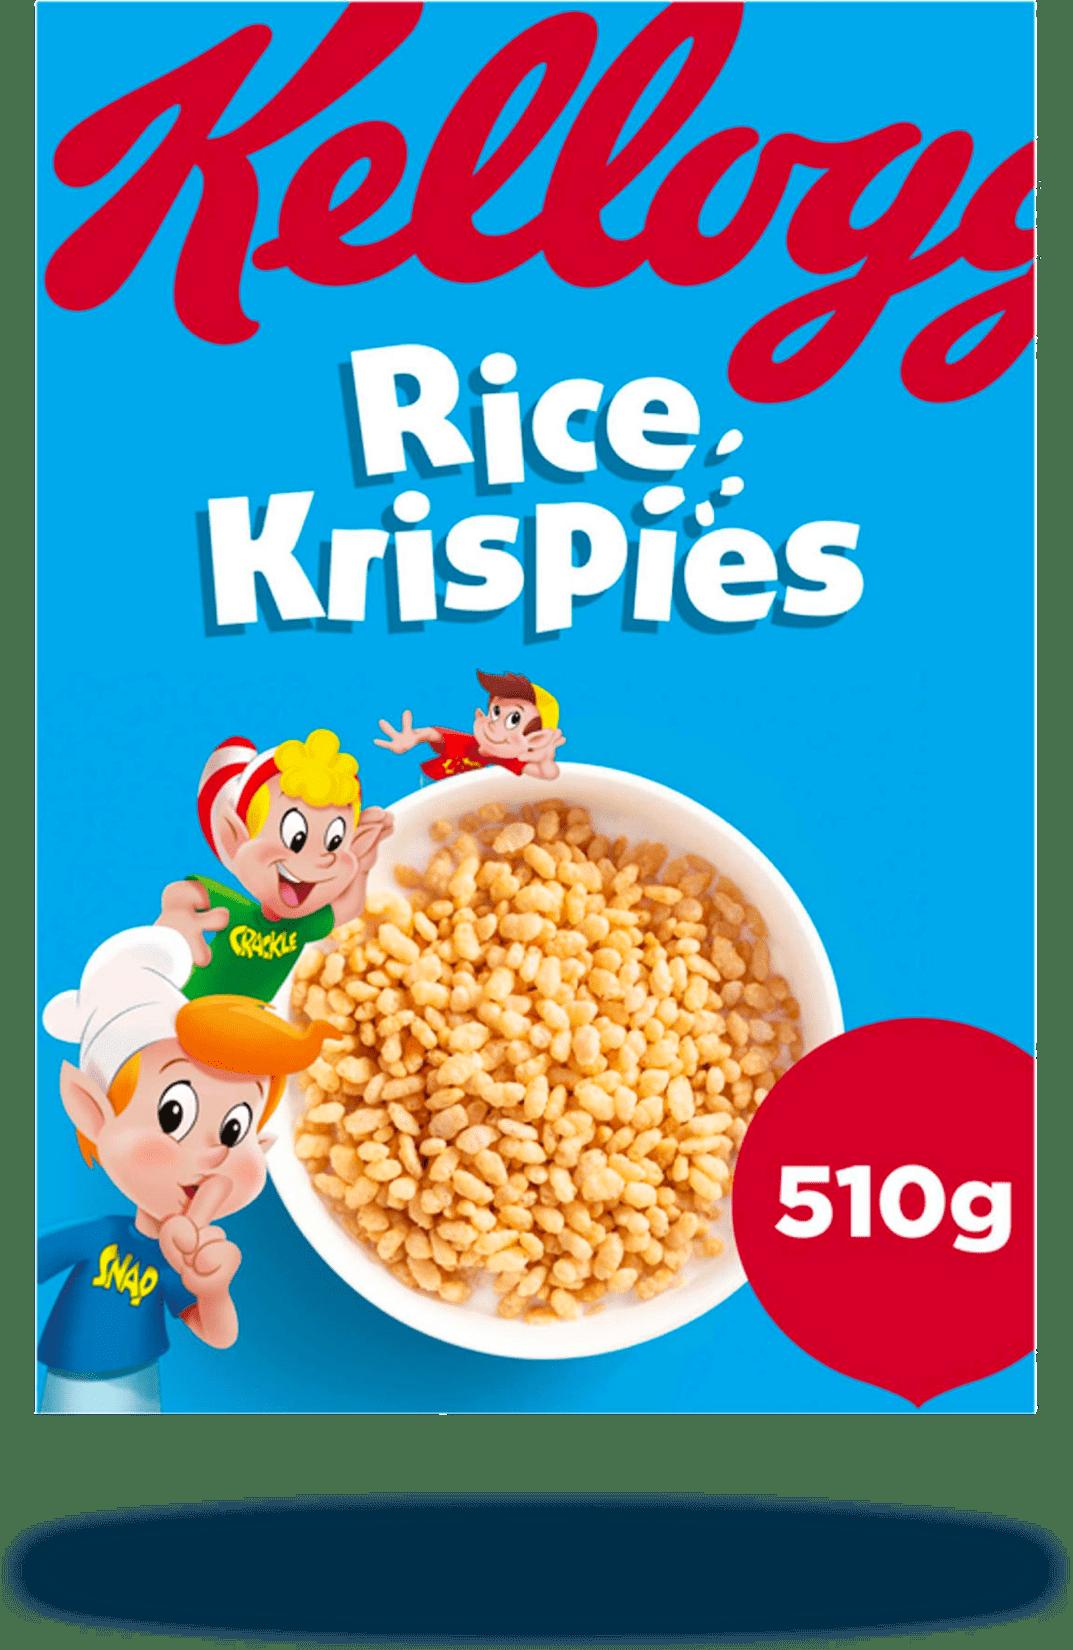 Cereals - Kellogs Rice Crispies 510g